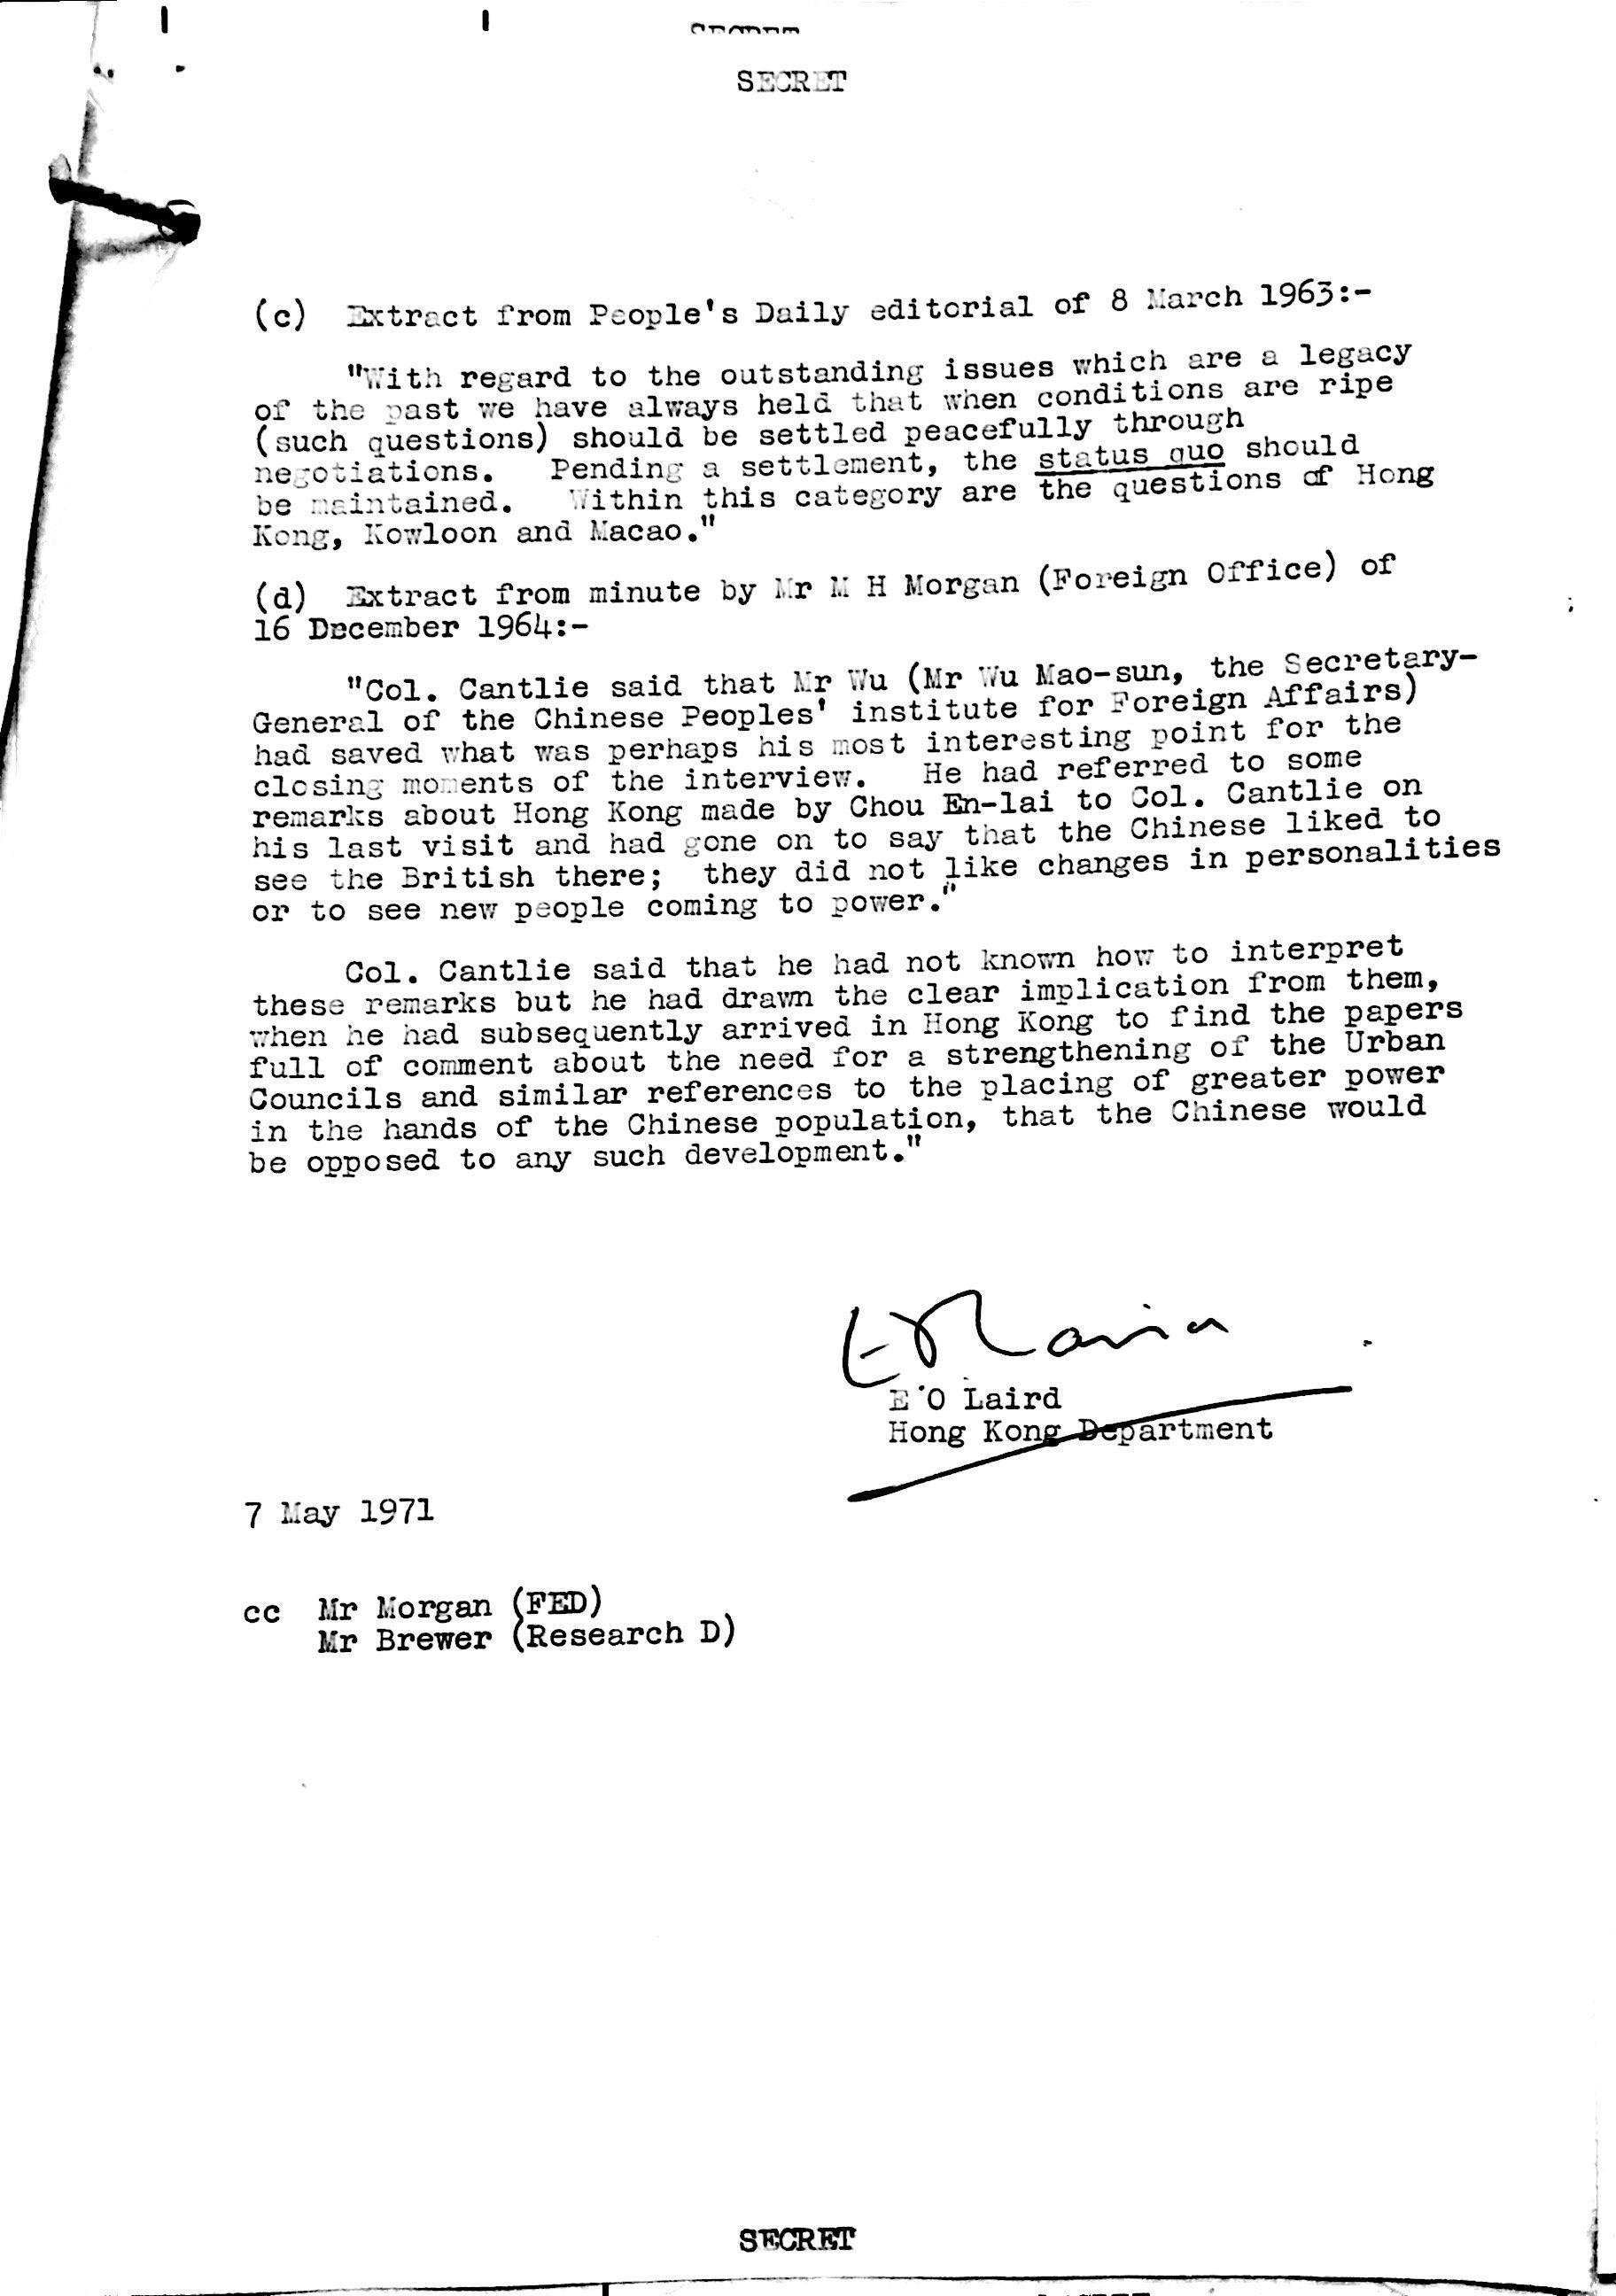 香港憲制發展檔案(Constitutional development of Hong Kong),現藏於英國國家檔案館,編號FCO 40_327於2002年解密。